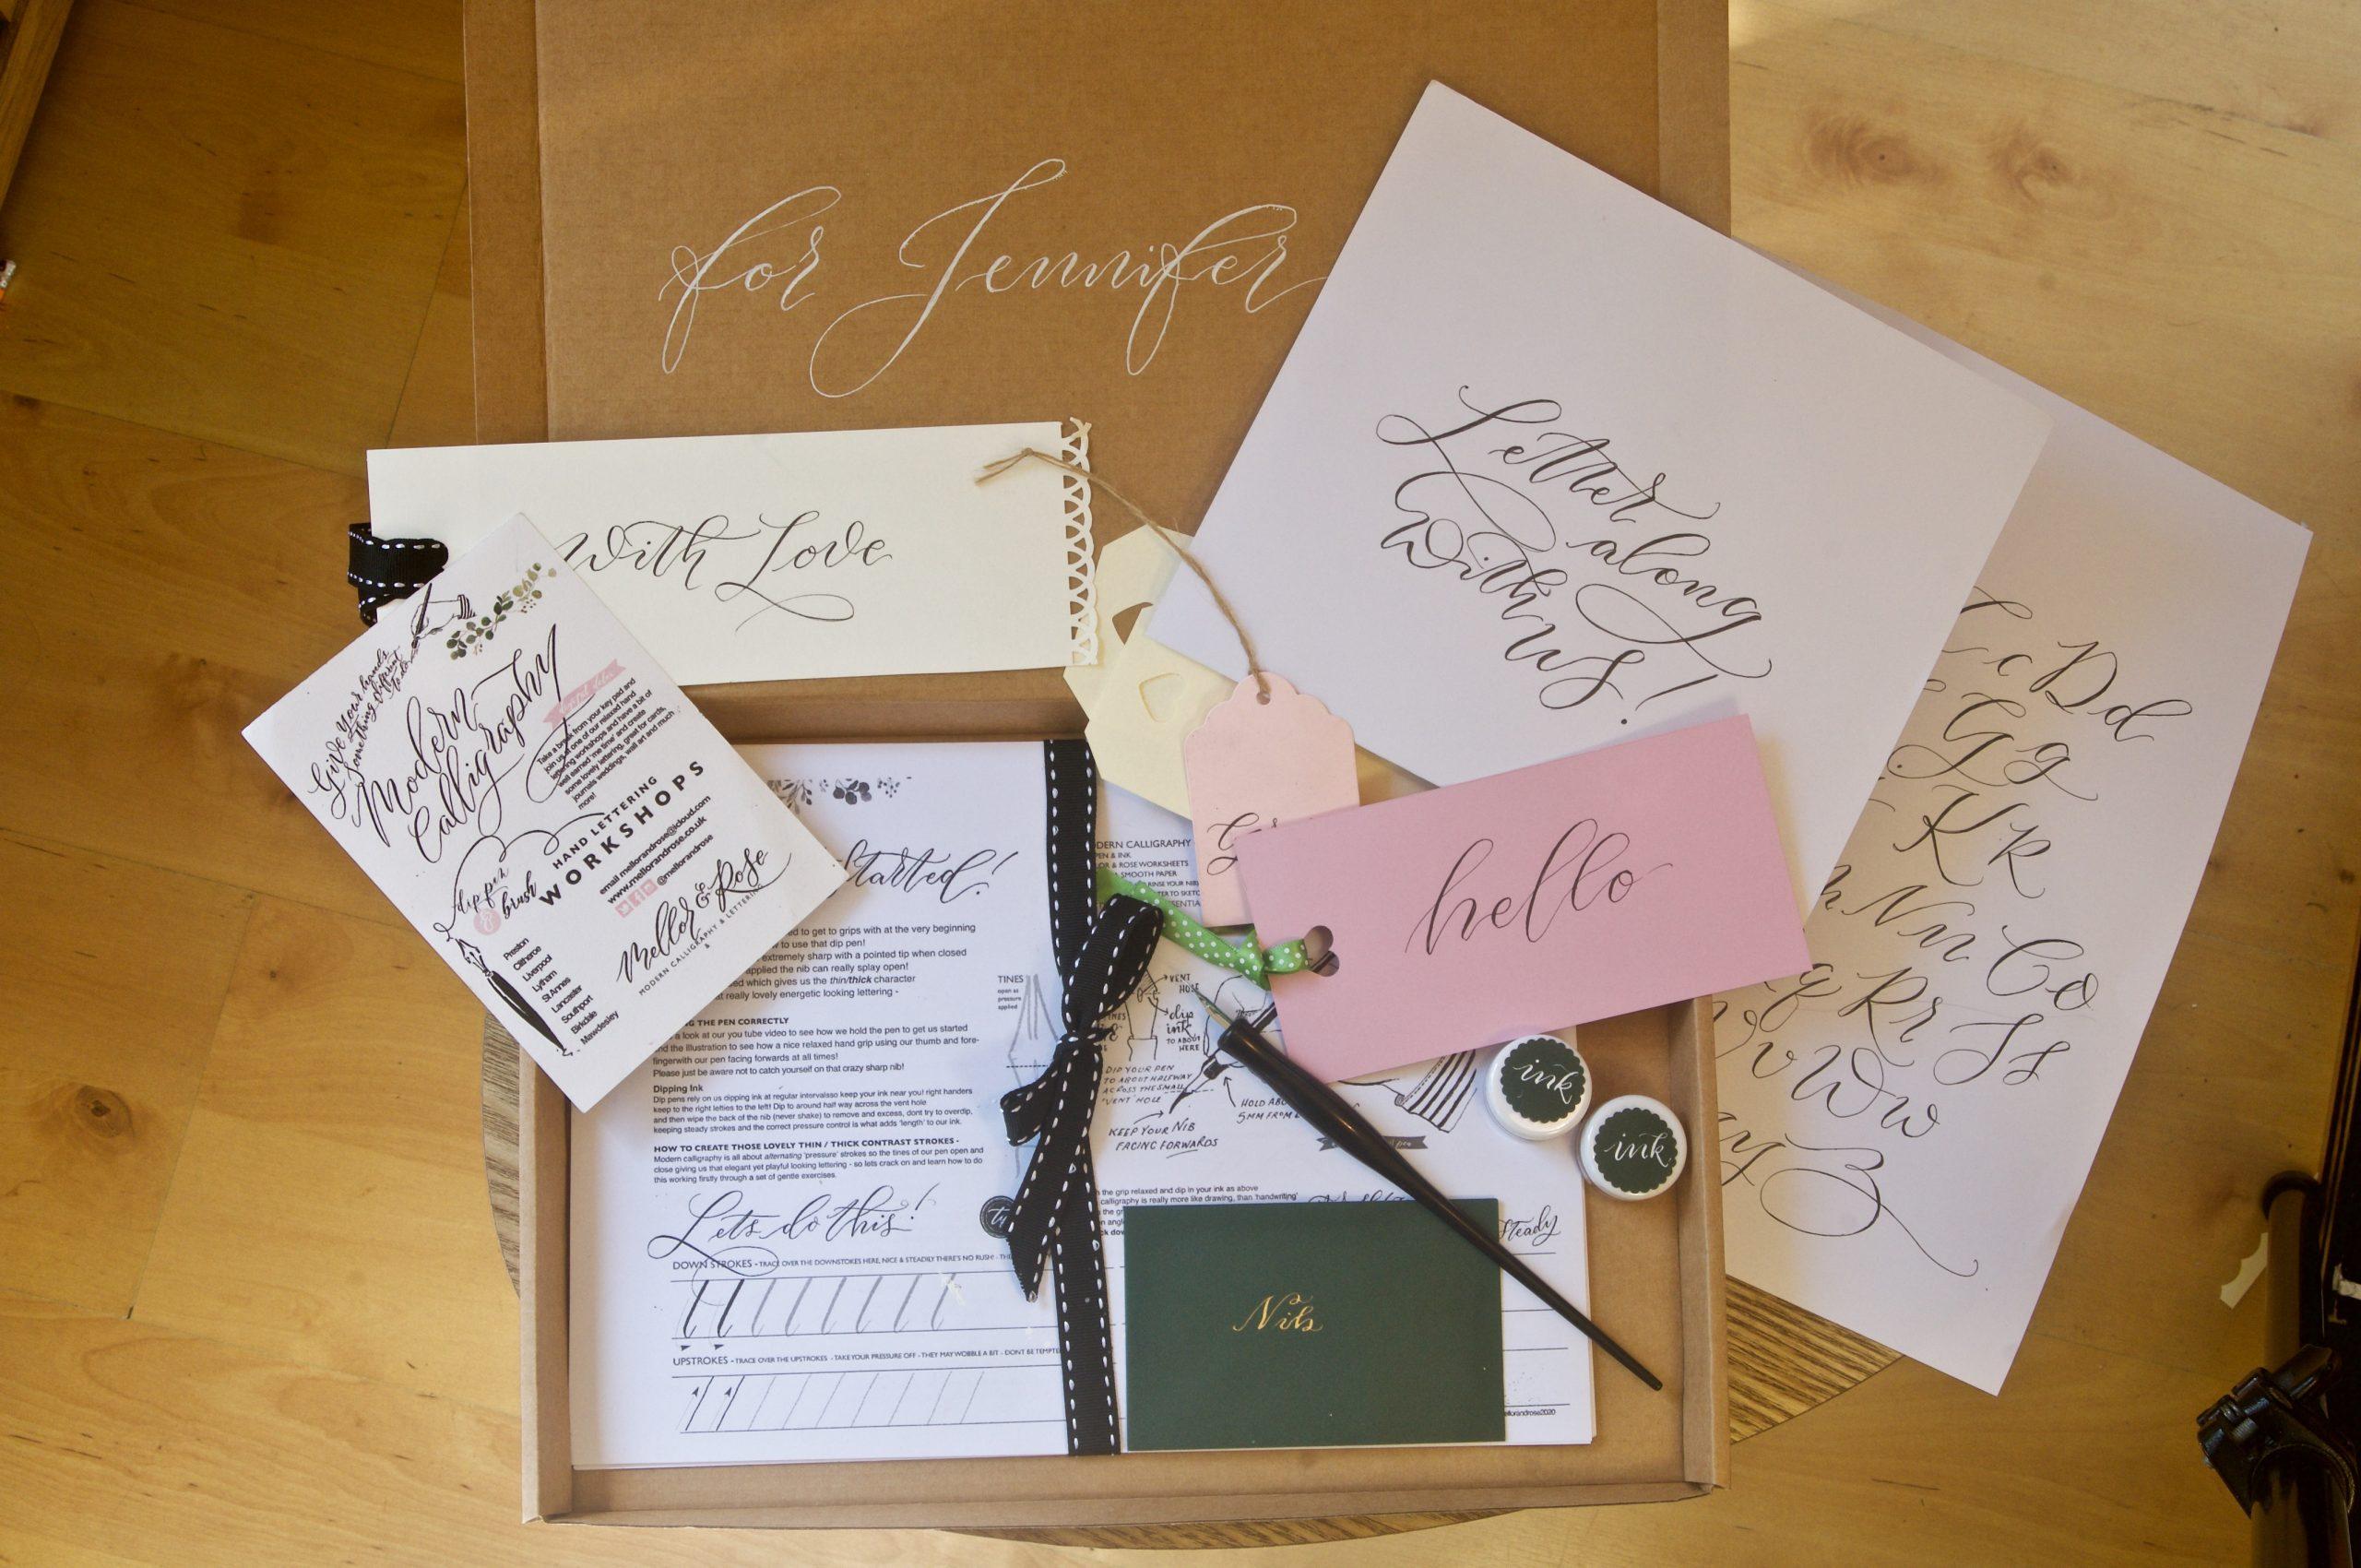 Mellor & Rose Modern Calligraphy Workbooks